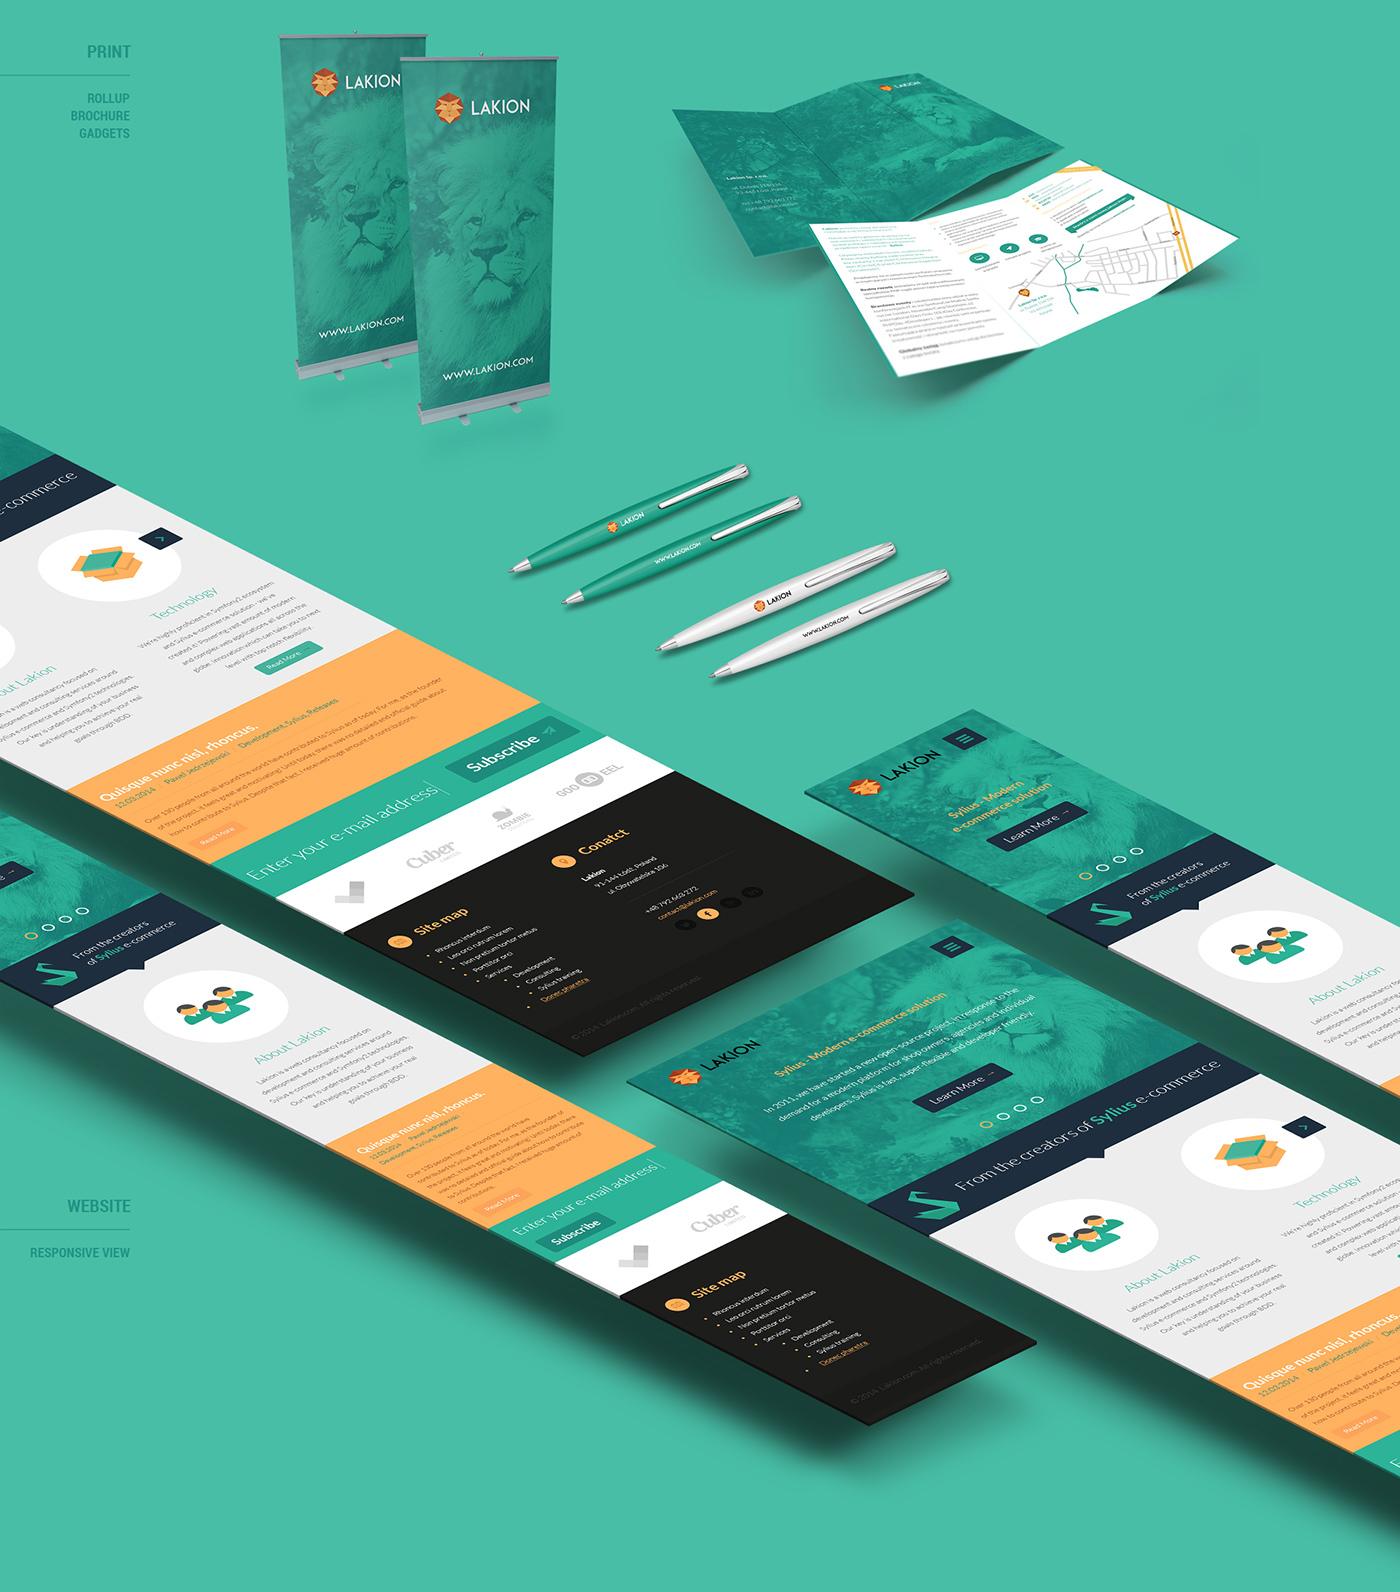 agency brochure cards lakion lion logo brand Web Responsive poland